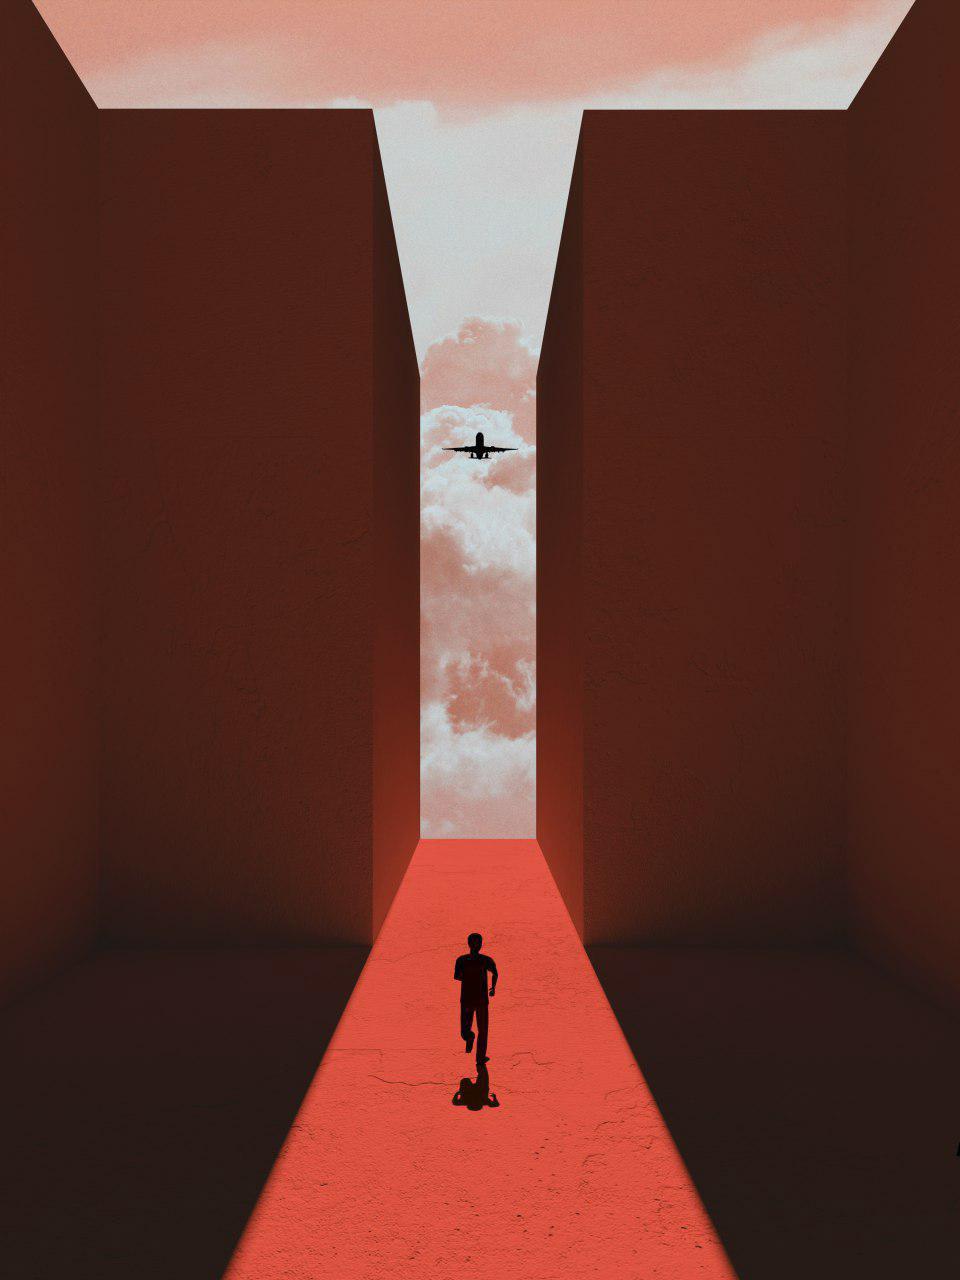 An illustrative exploration of shadows by Anastasiya Kraynyuk